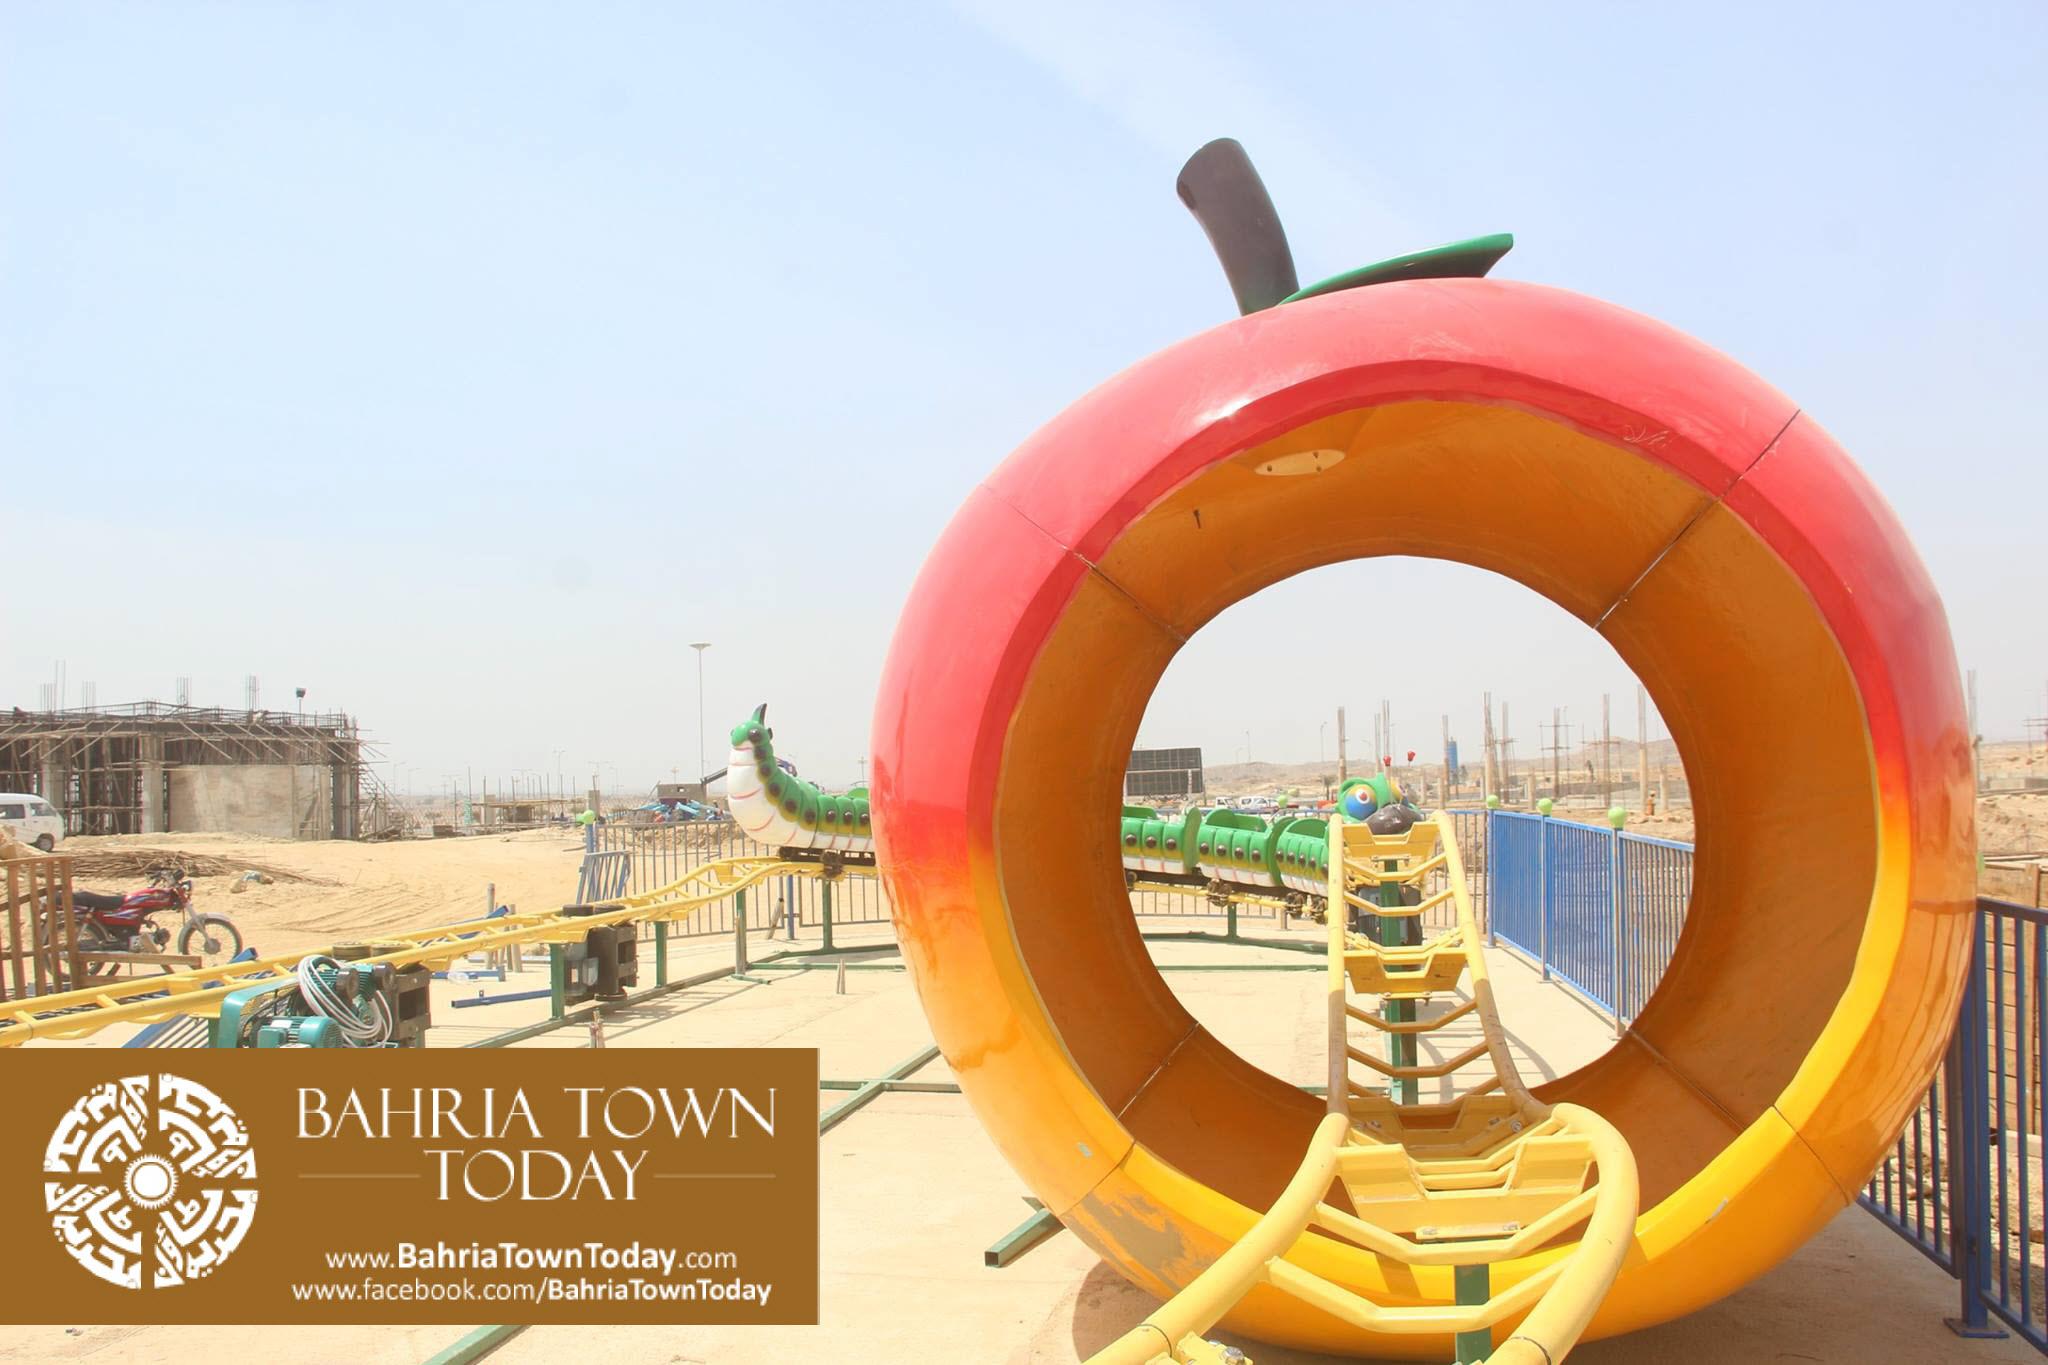 Bahria Adventura Theme Park Karachi Latest Progress Update – April 2016 (14)